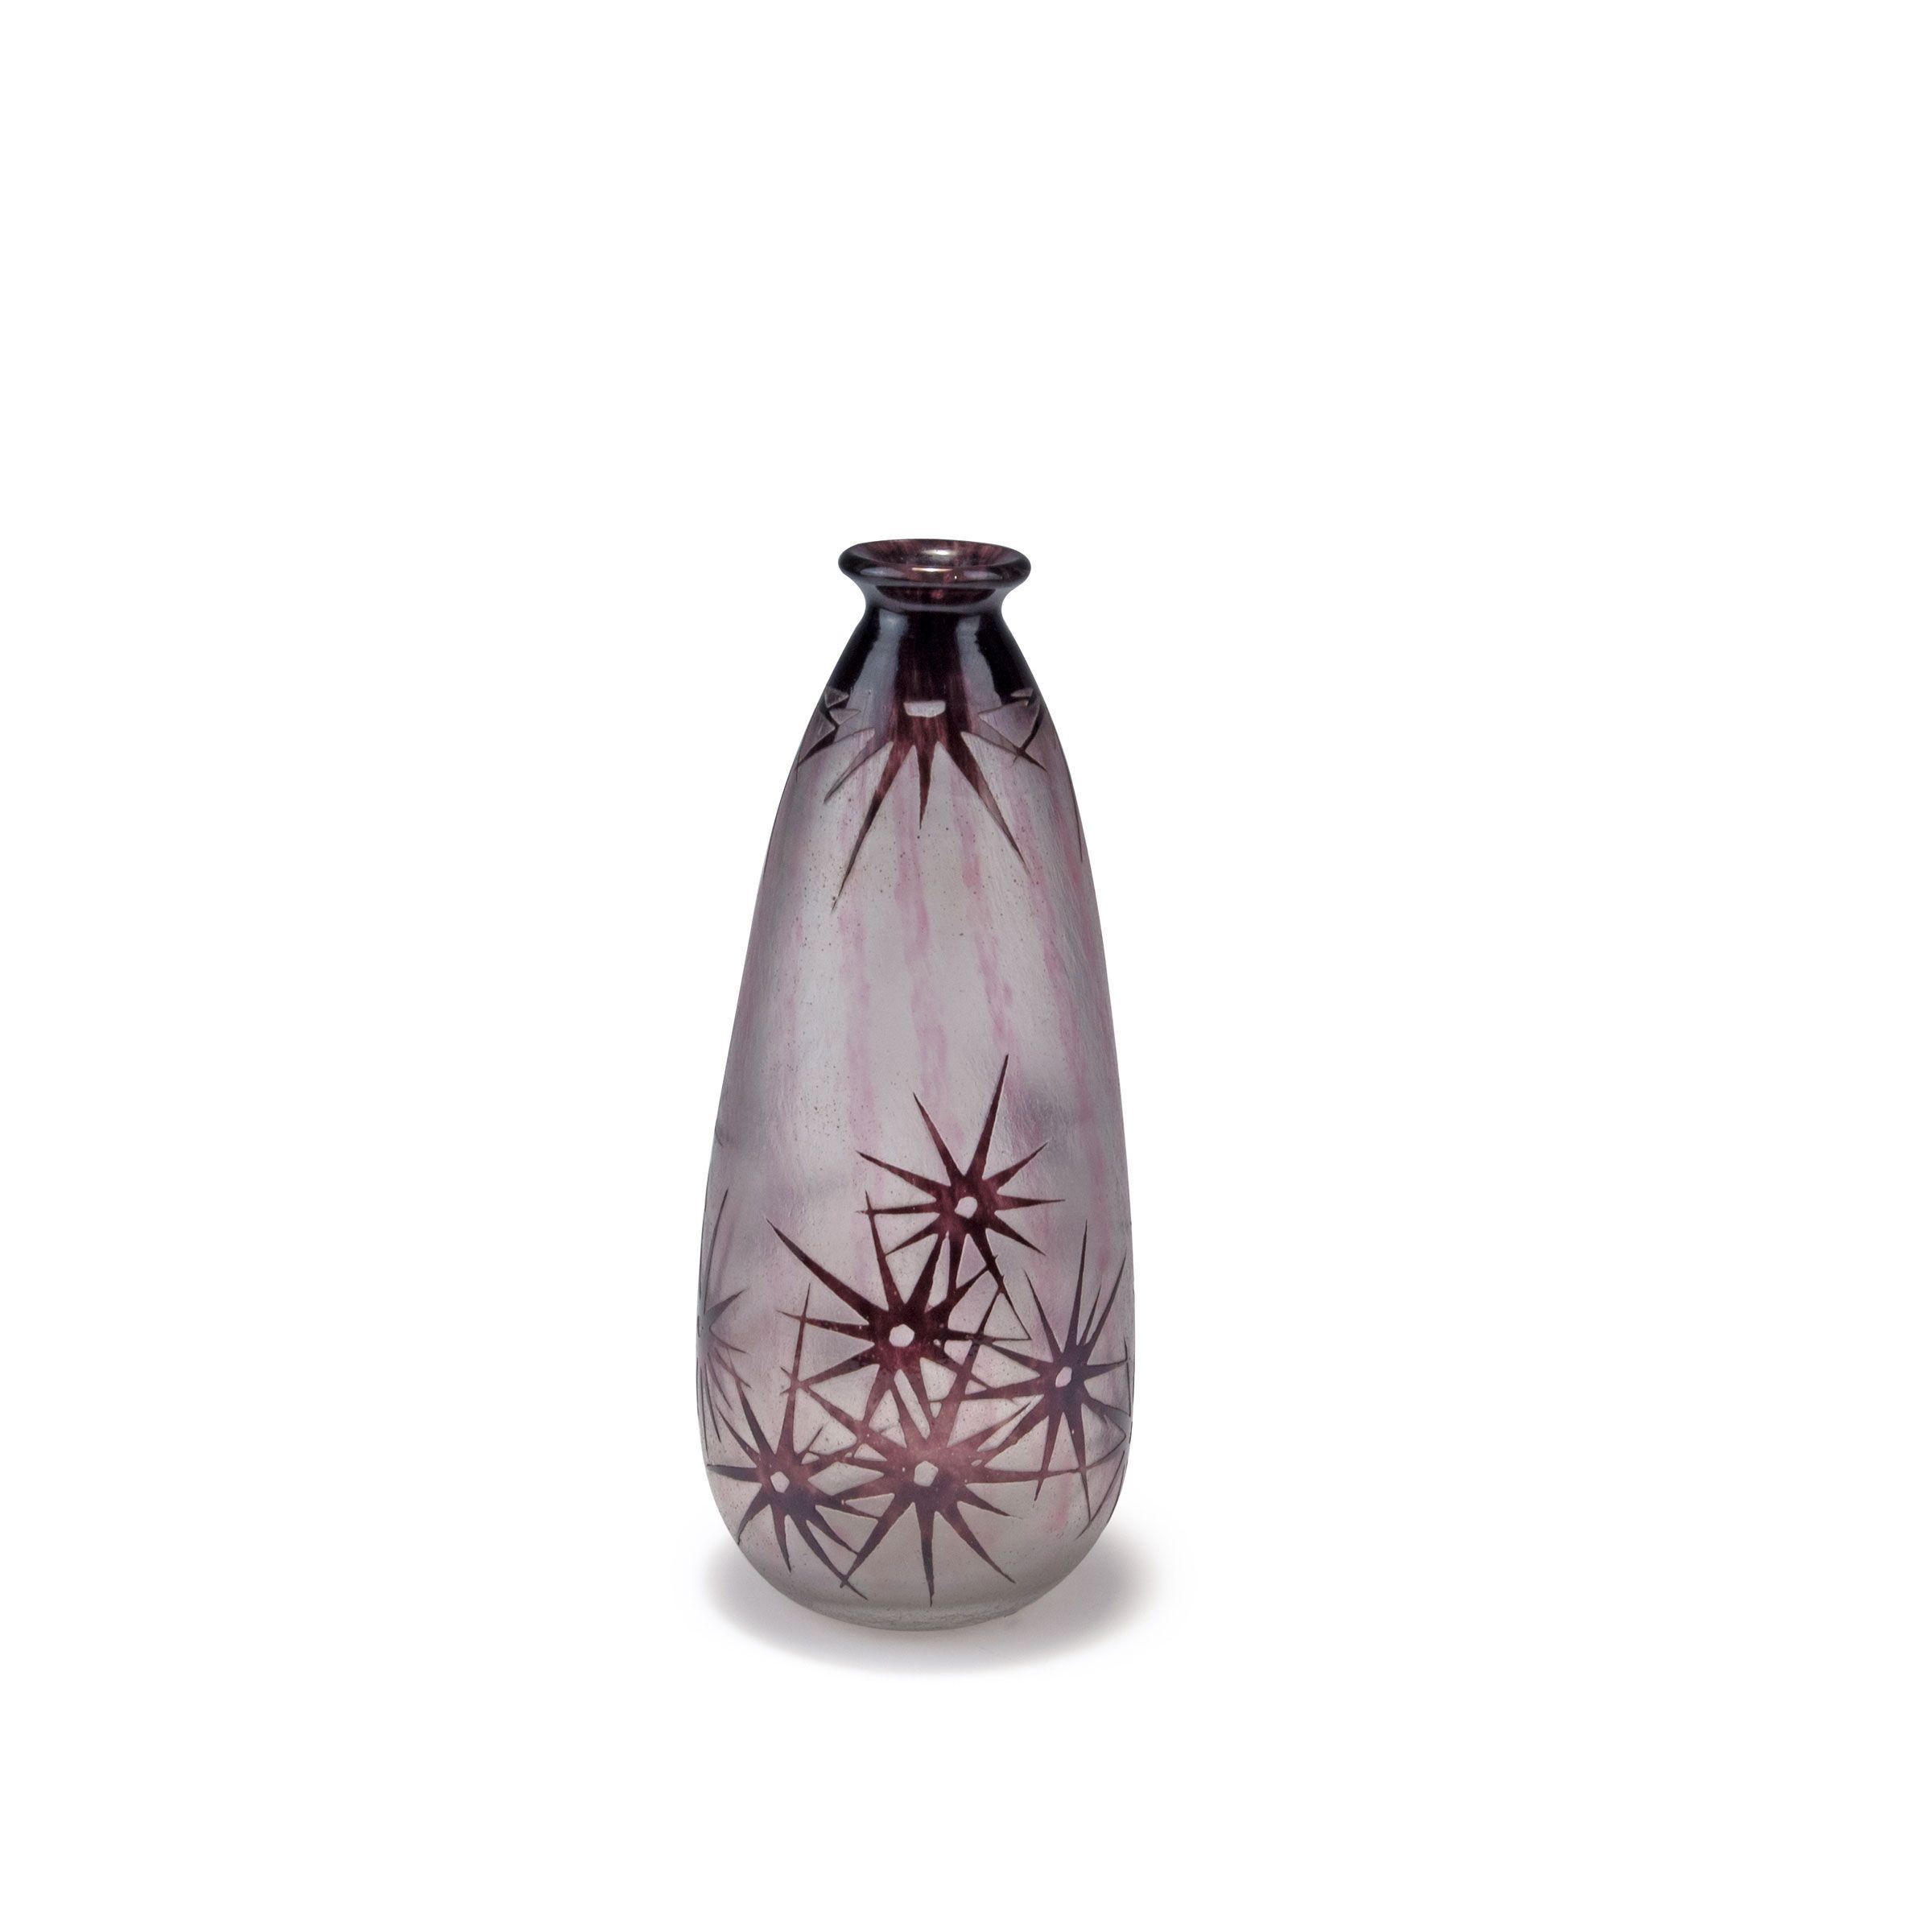 Lot 117A238 - 'Etoiles' vase, 1918-21 Schneider, Epinay-sur-Seine -> Auction 117A - Text: english Version